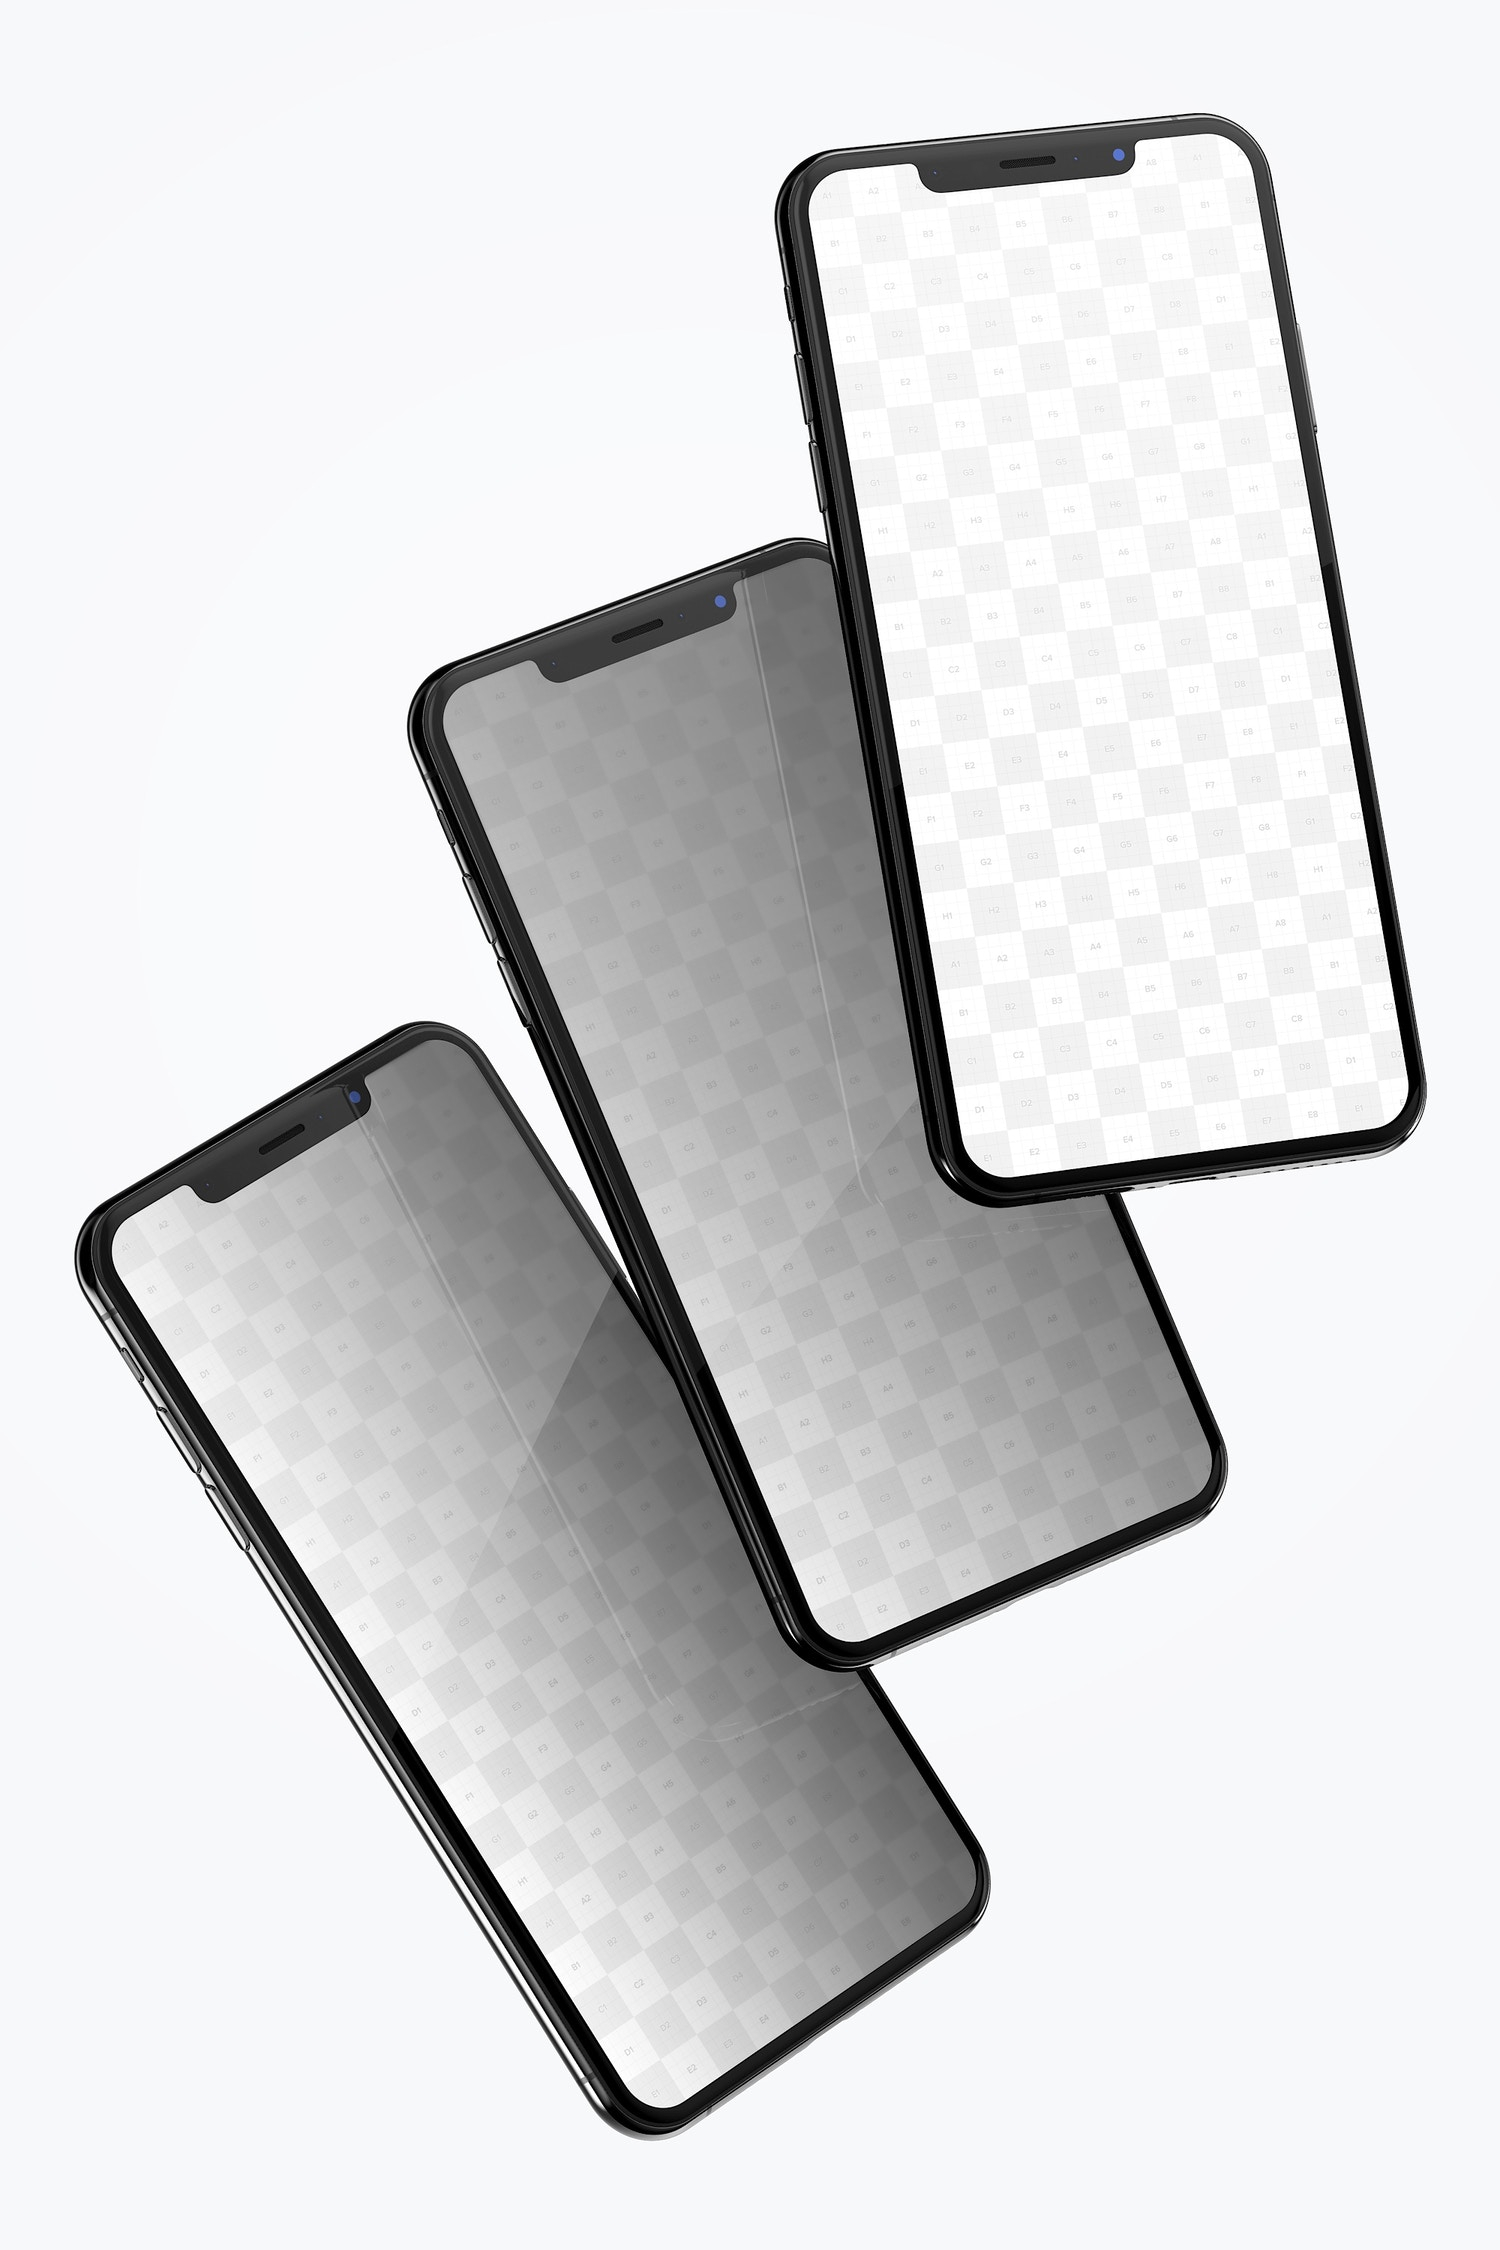 iPhone XS Max Mockup 08 (2) by Original Mockups on Original Mockups